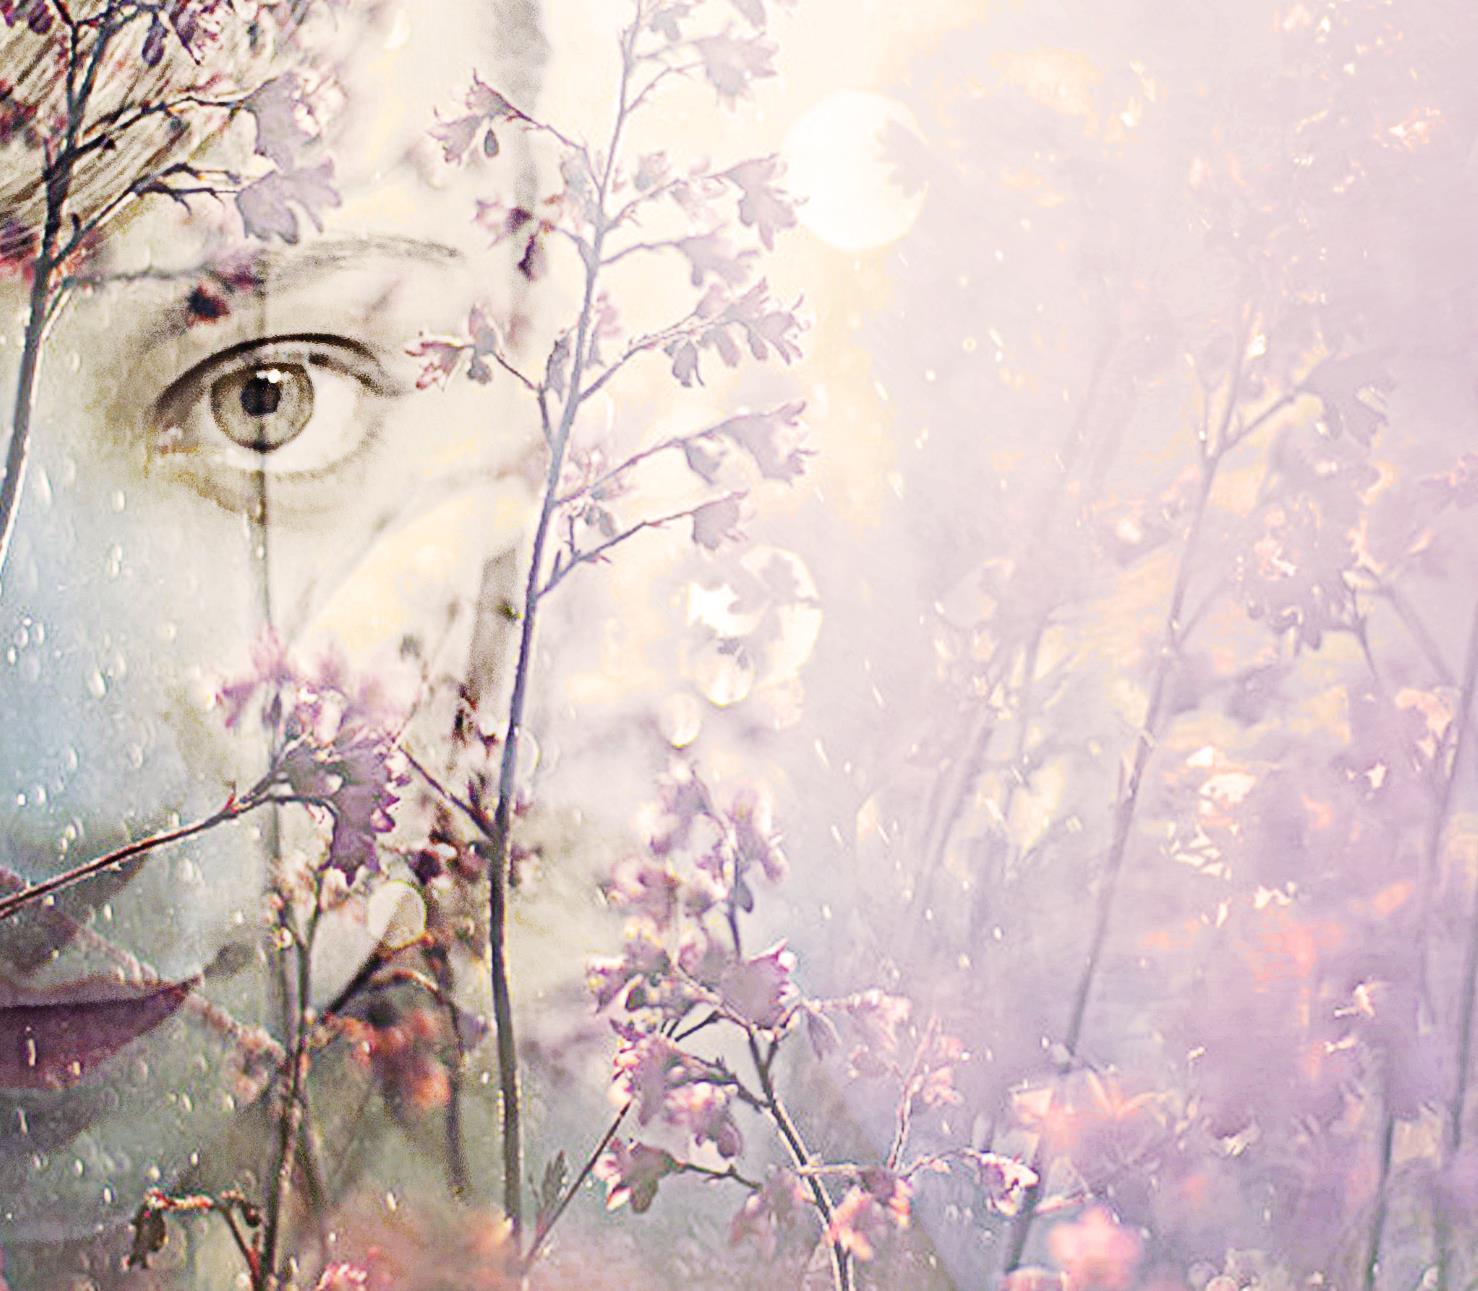 flowers, magic, portrait, creative, italian photography, woman